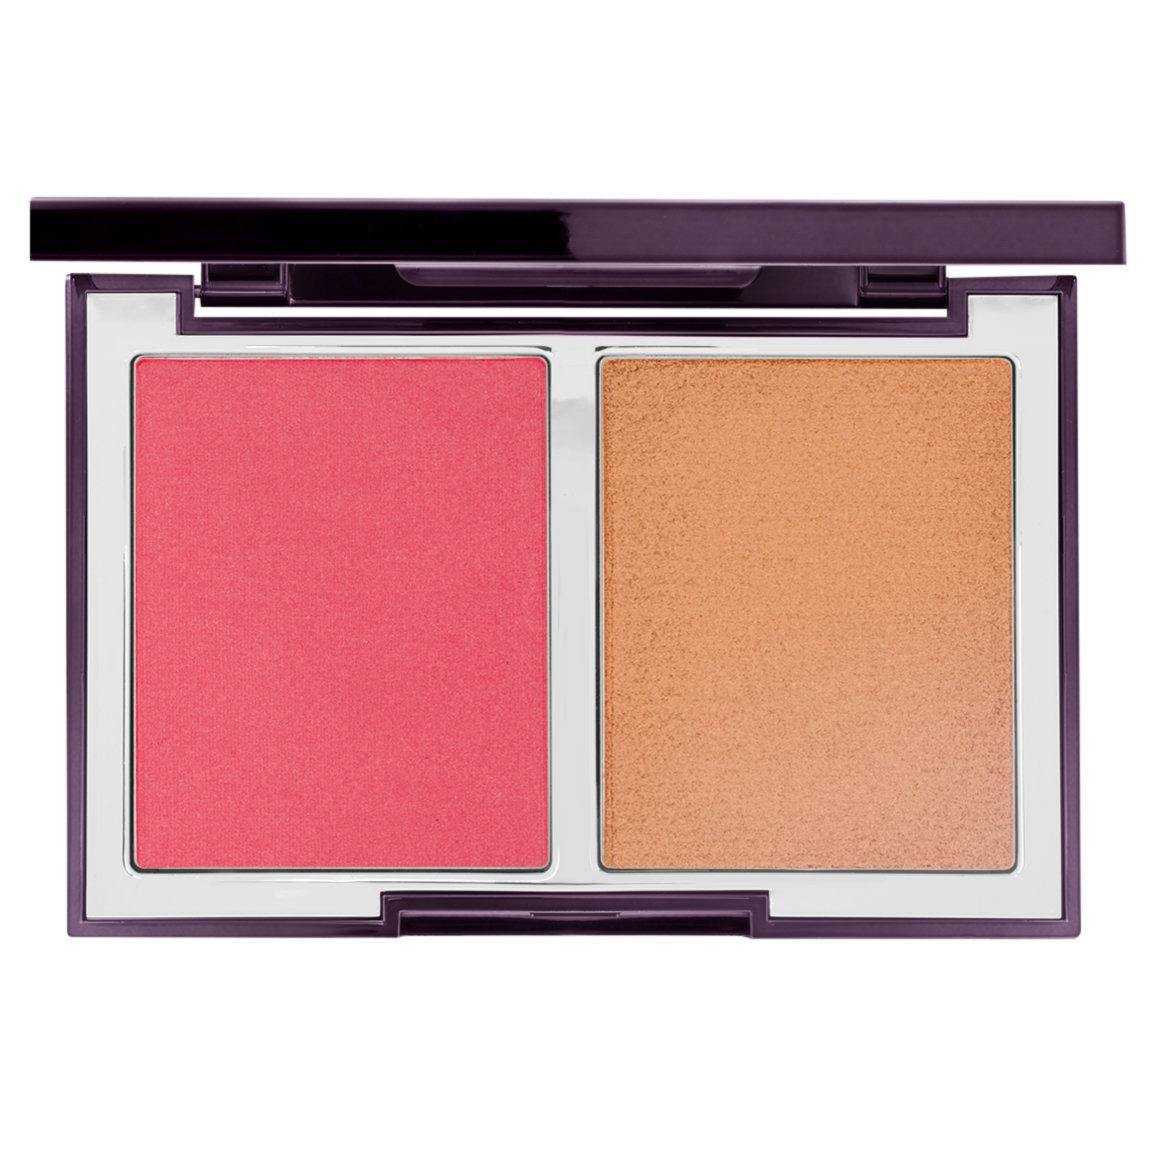 Wayne Goss The Weightless Veil Blush Palette Bright Poppy alternative view 1 - product swatch.